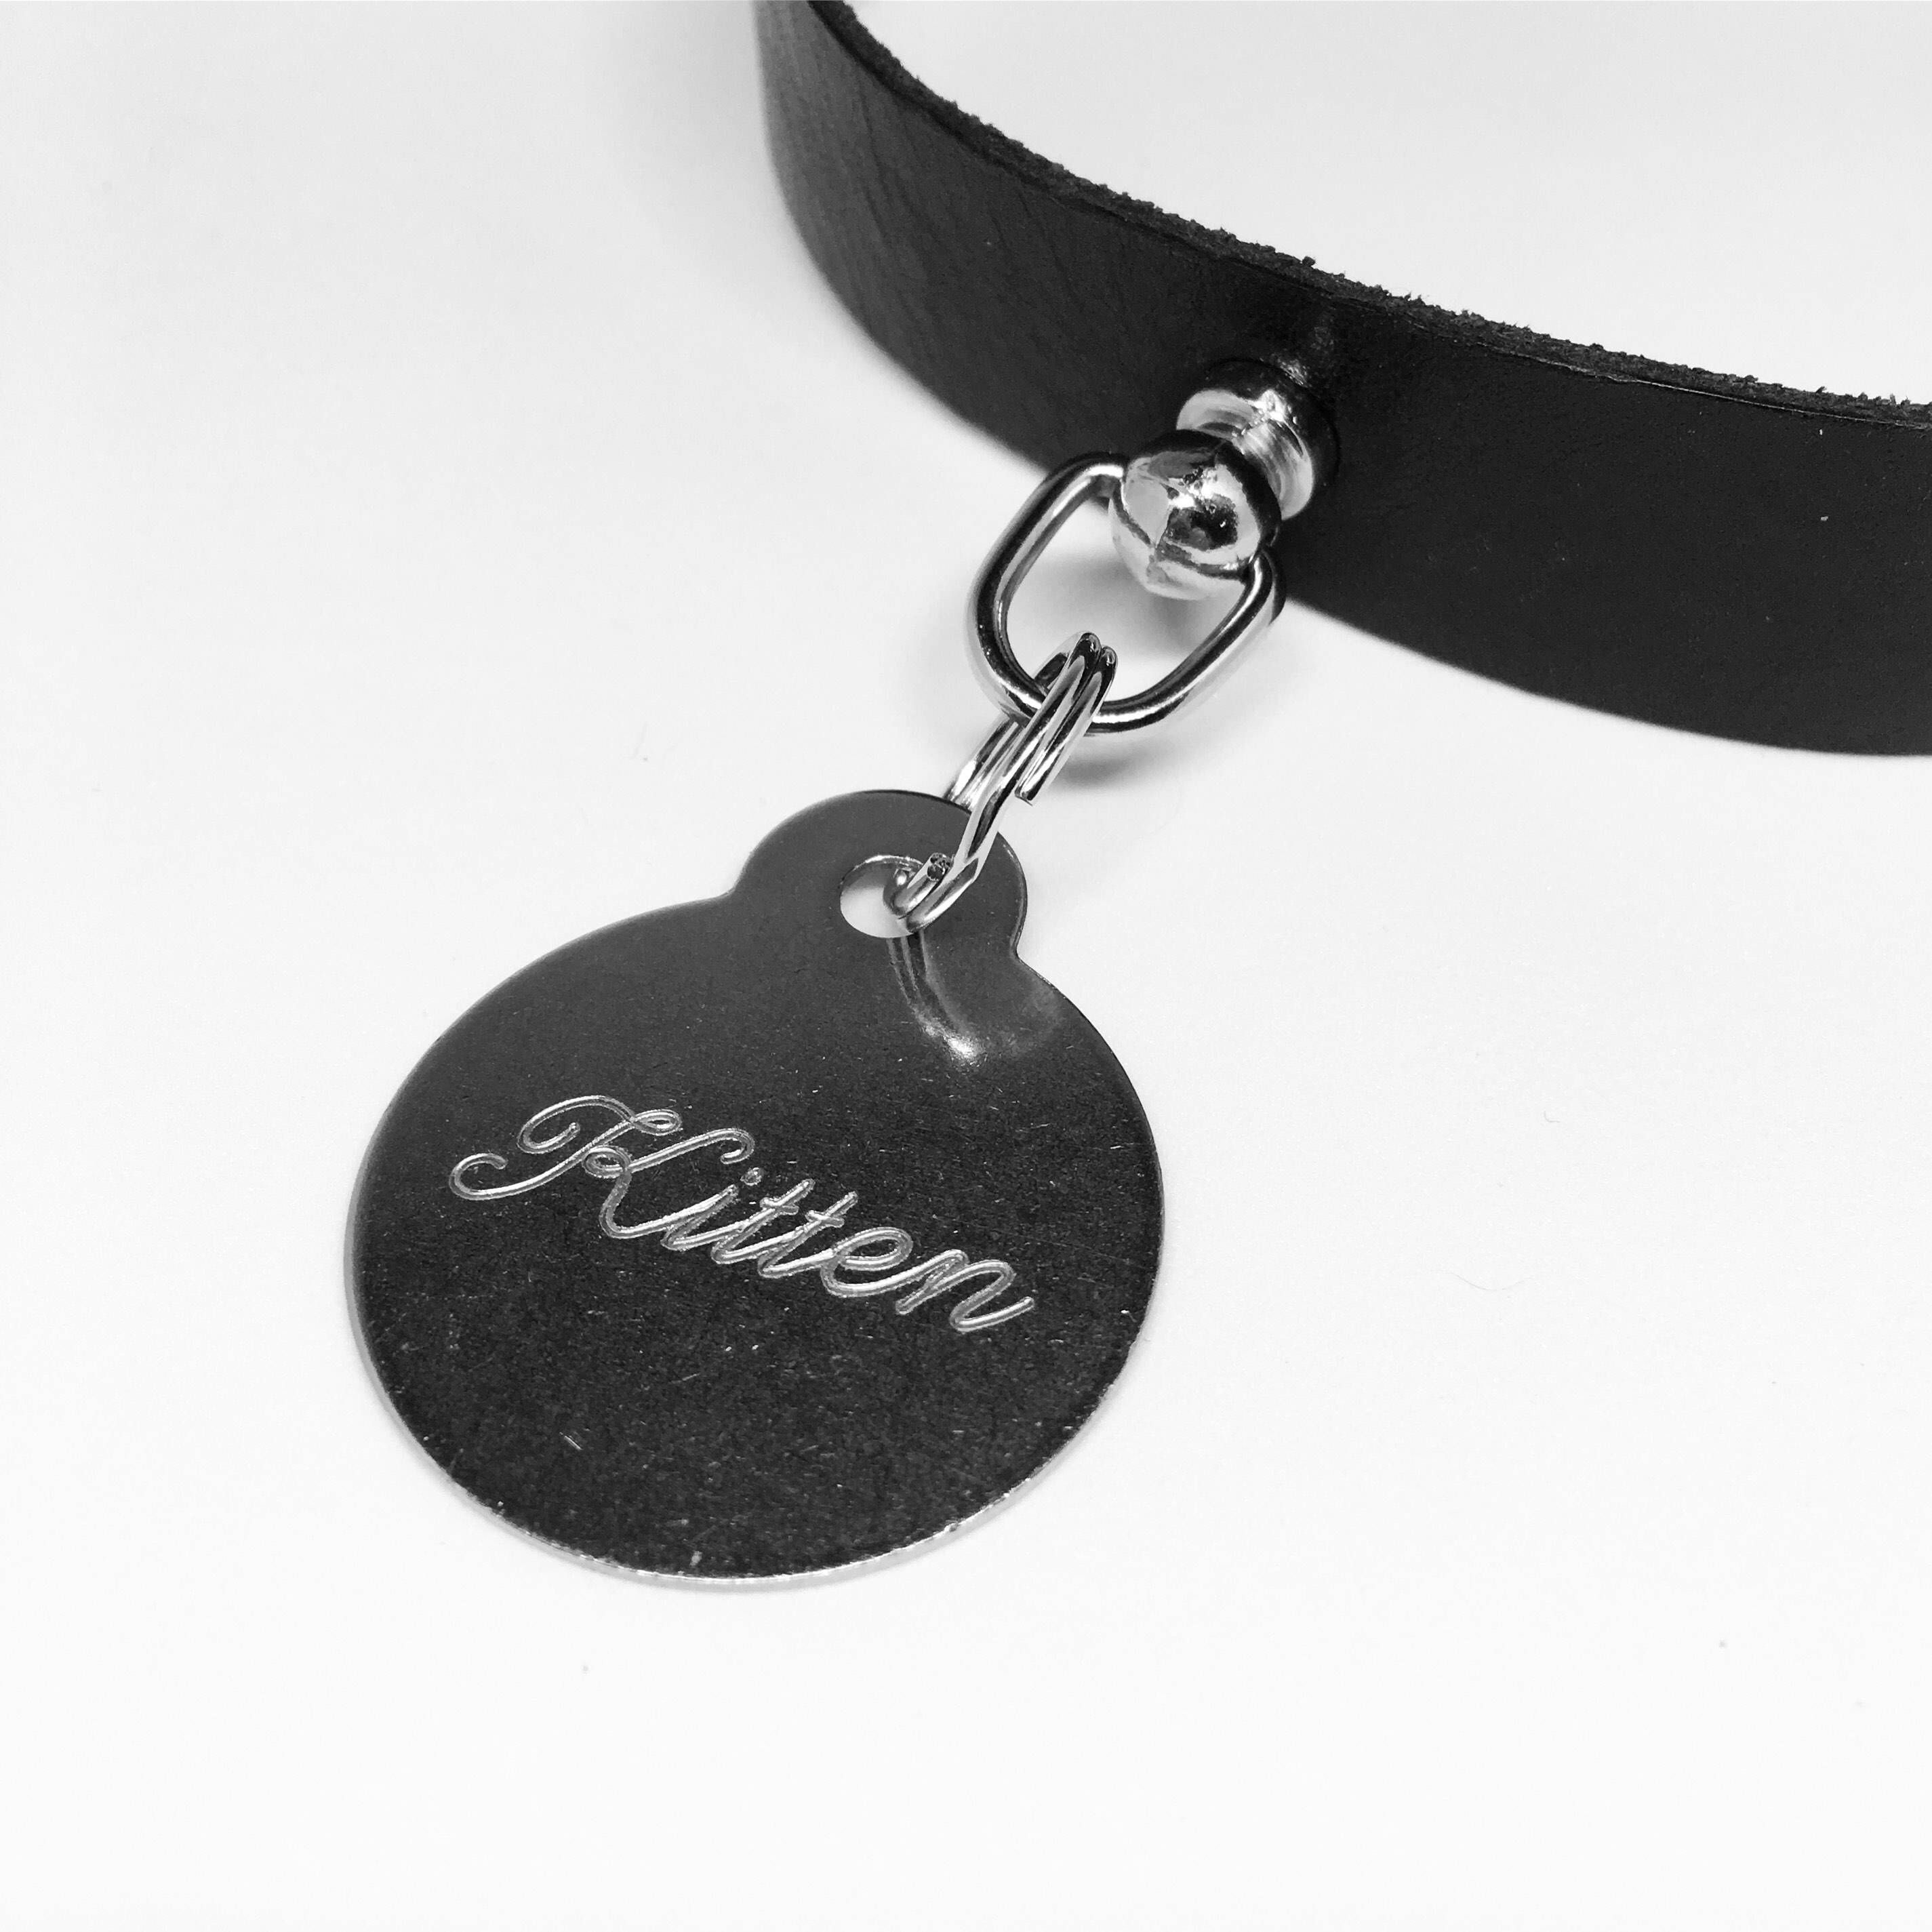 Kitten Collar Tag Pet Play Collar Tag Submissive Collar Tag Bdsm Day Collar Tag Ddlg Collar Charm